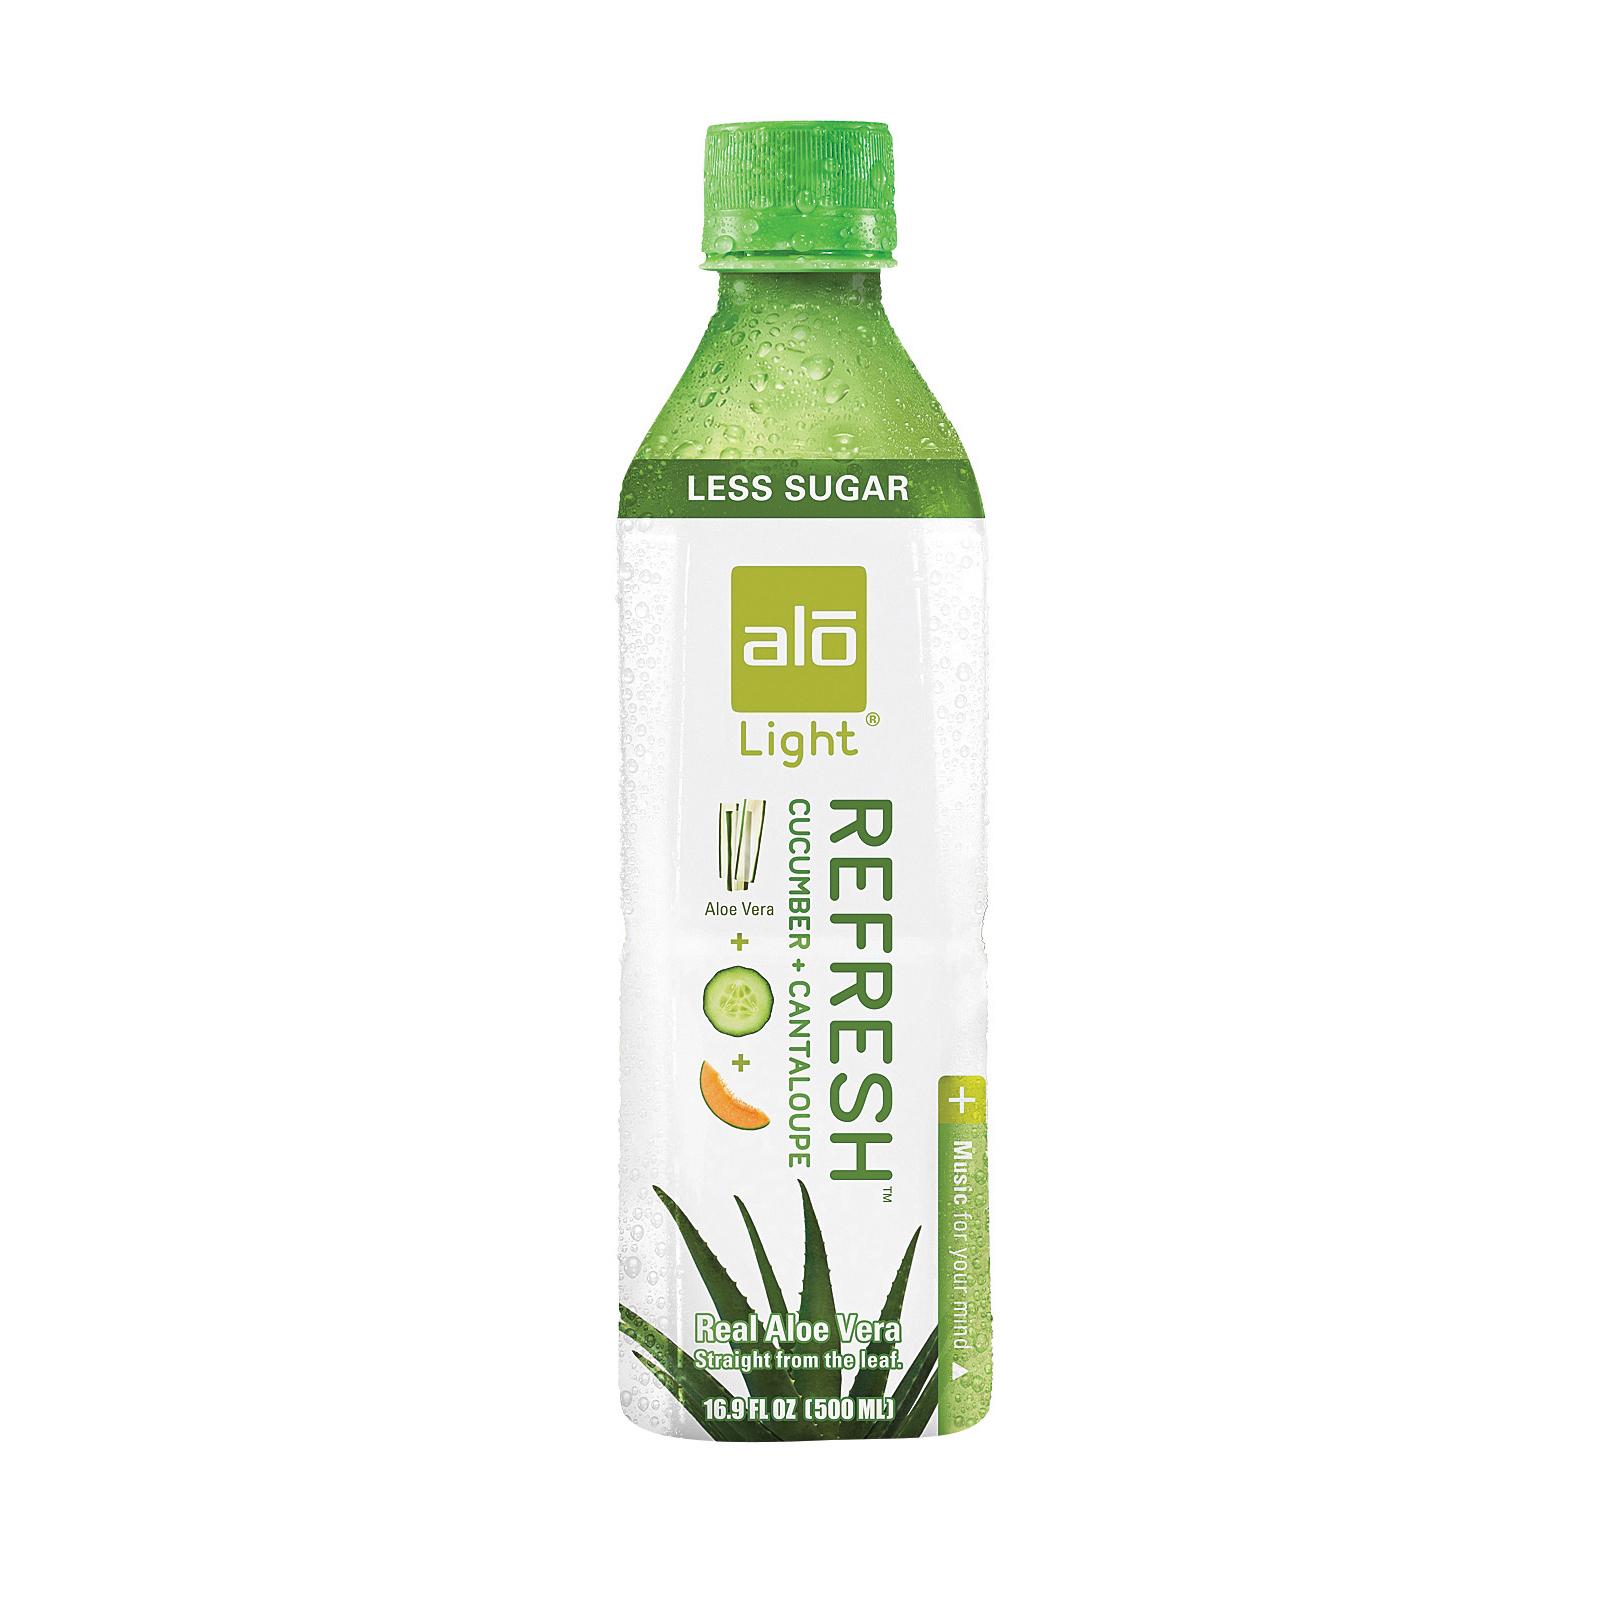 Alo Light Refresh Aloe Vera Juice Drink - Cucumber and Cantaloupe - Case of 12 - 16.9 fl oz.